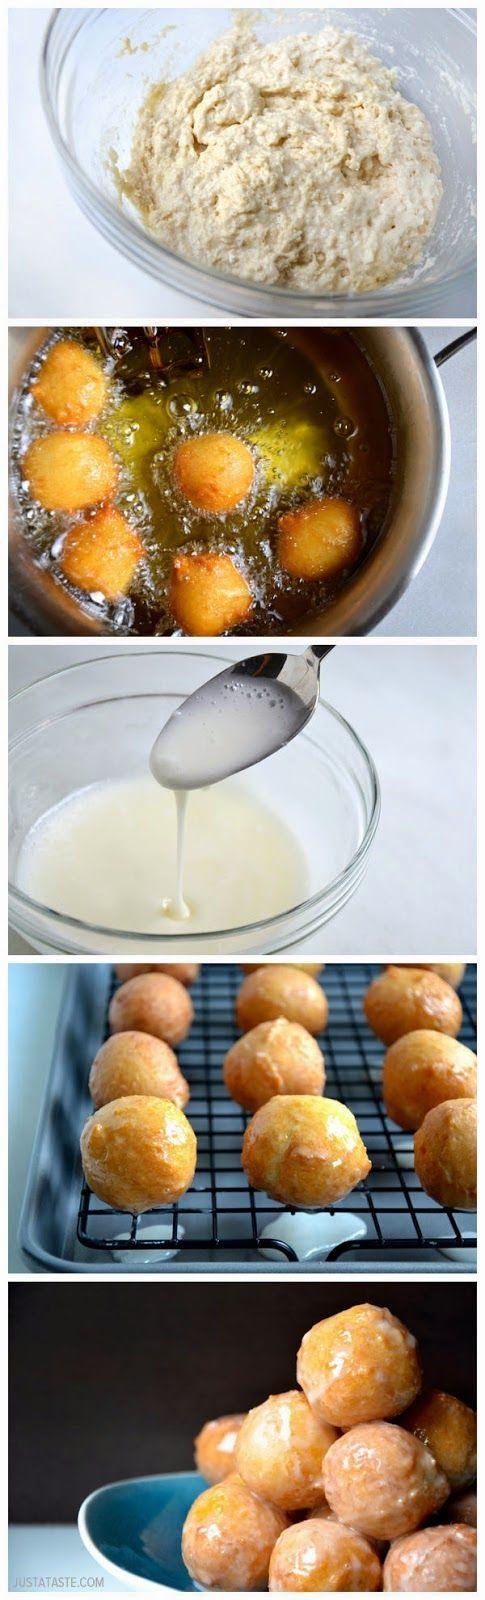 How To Make Easy Homemade Glazed Doughnut Holes